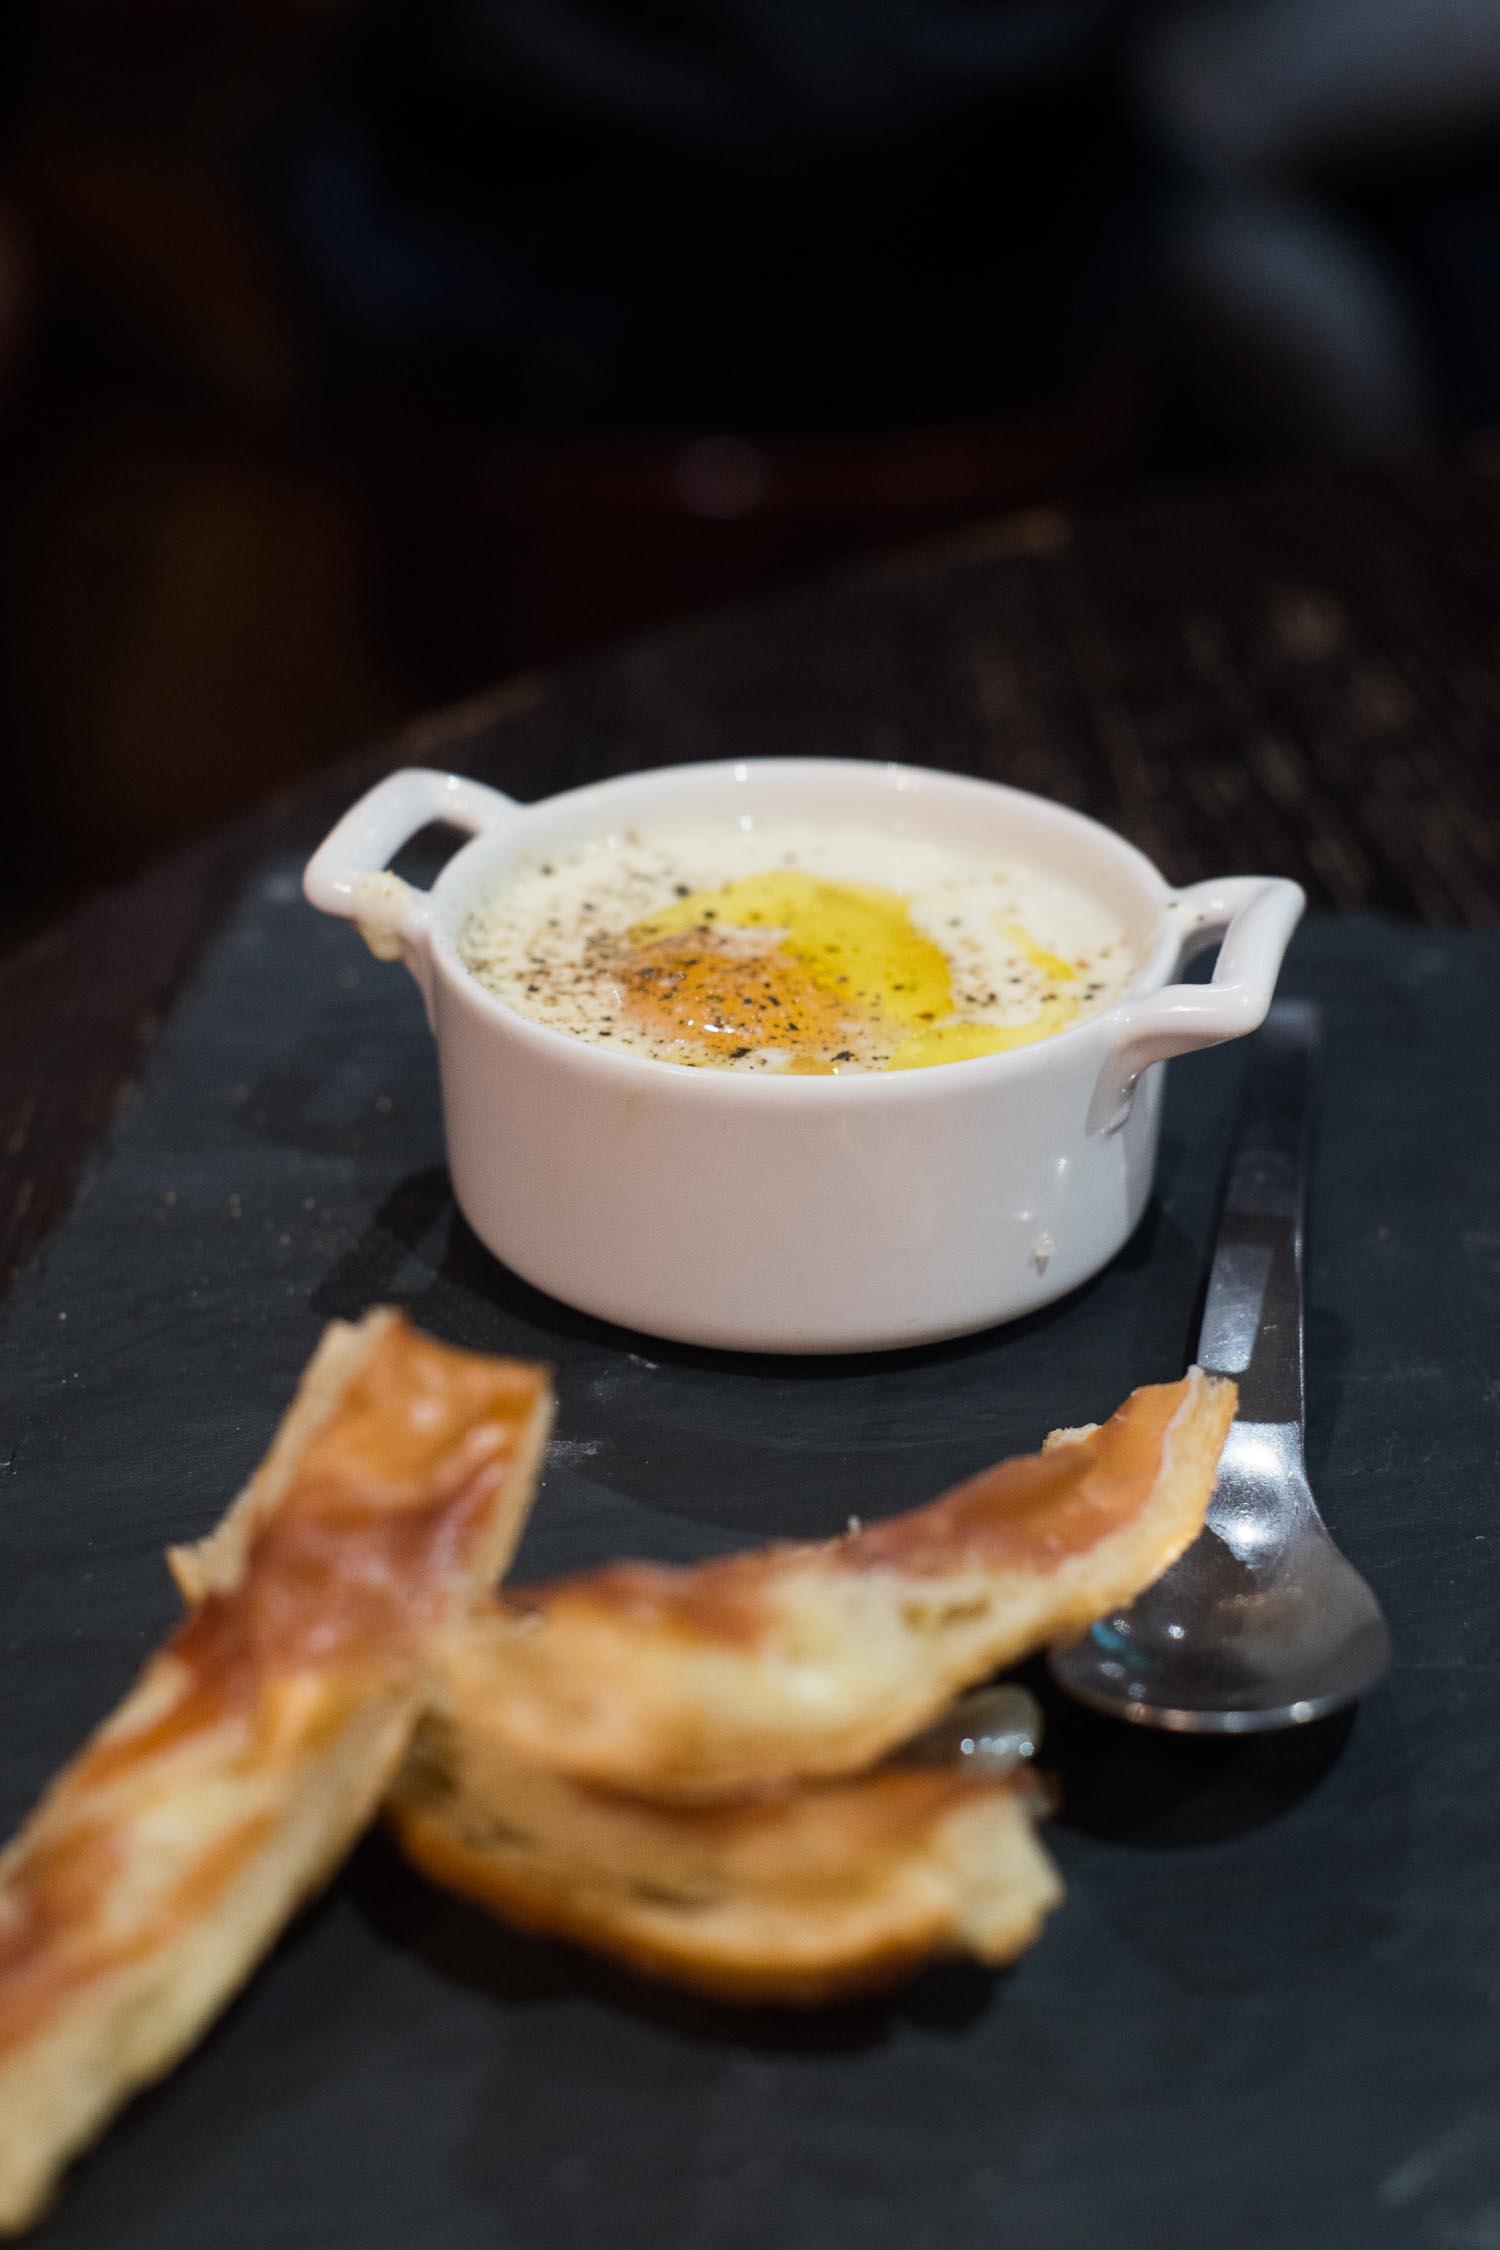 Restaurant basque ba tona la rochelle vie de miettes - La table basque la rochelle ...